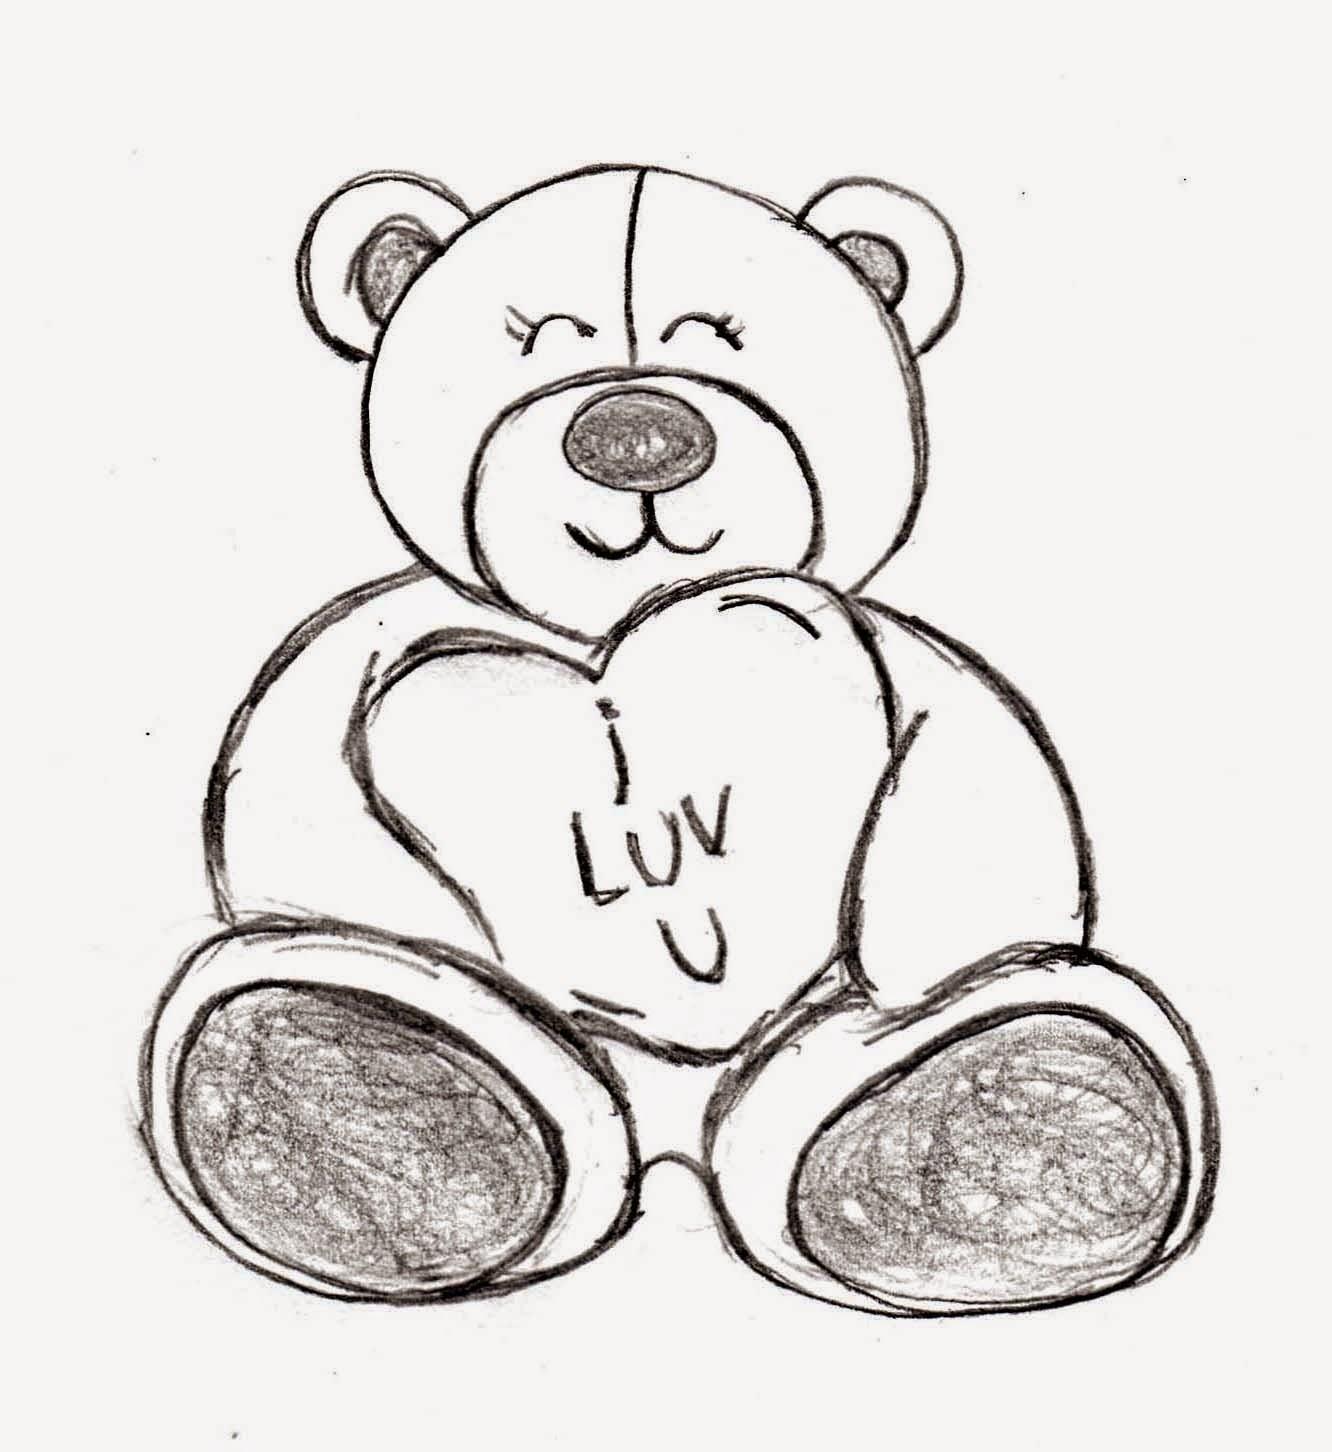 Drawingmanuals Com And Drawissimo Kids Draw And Enjoy On Google Play